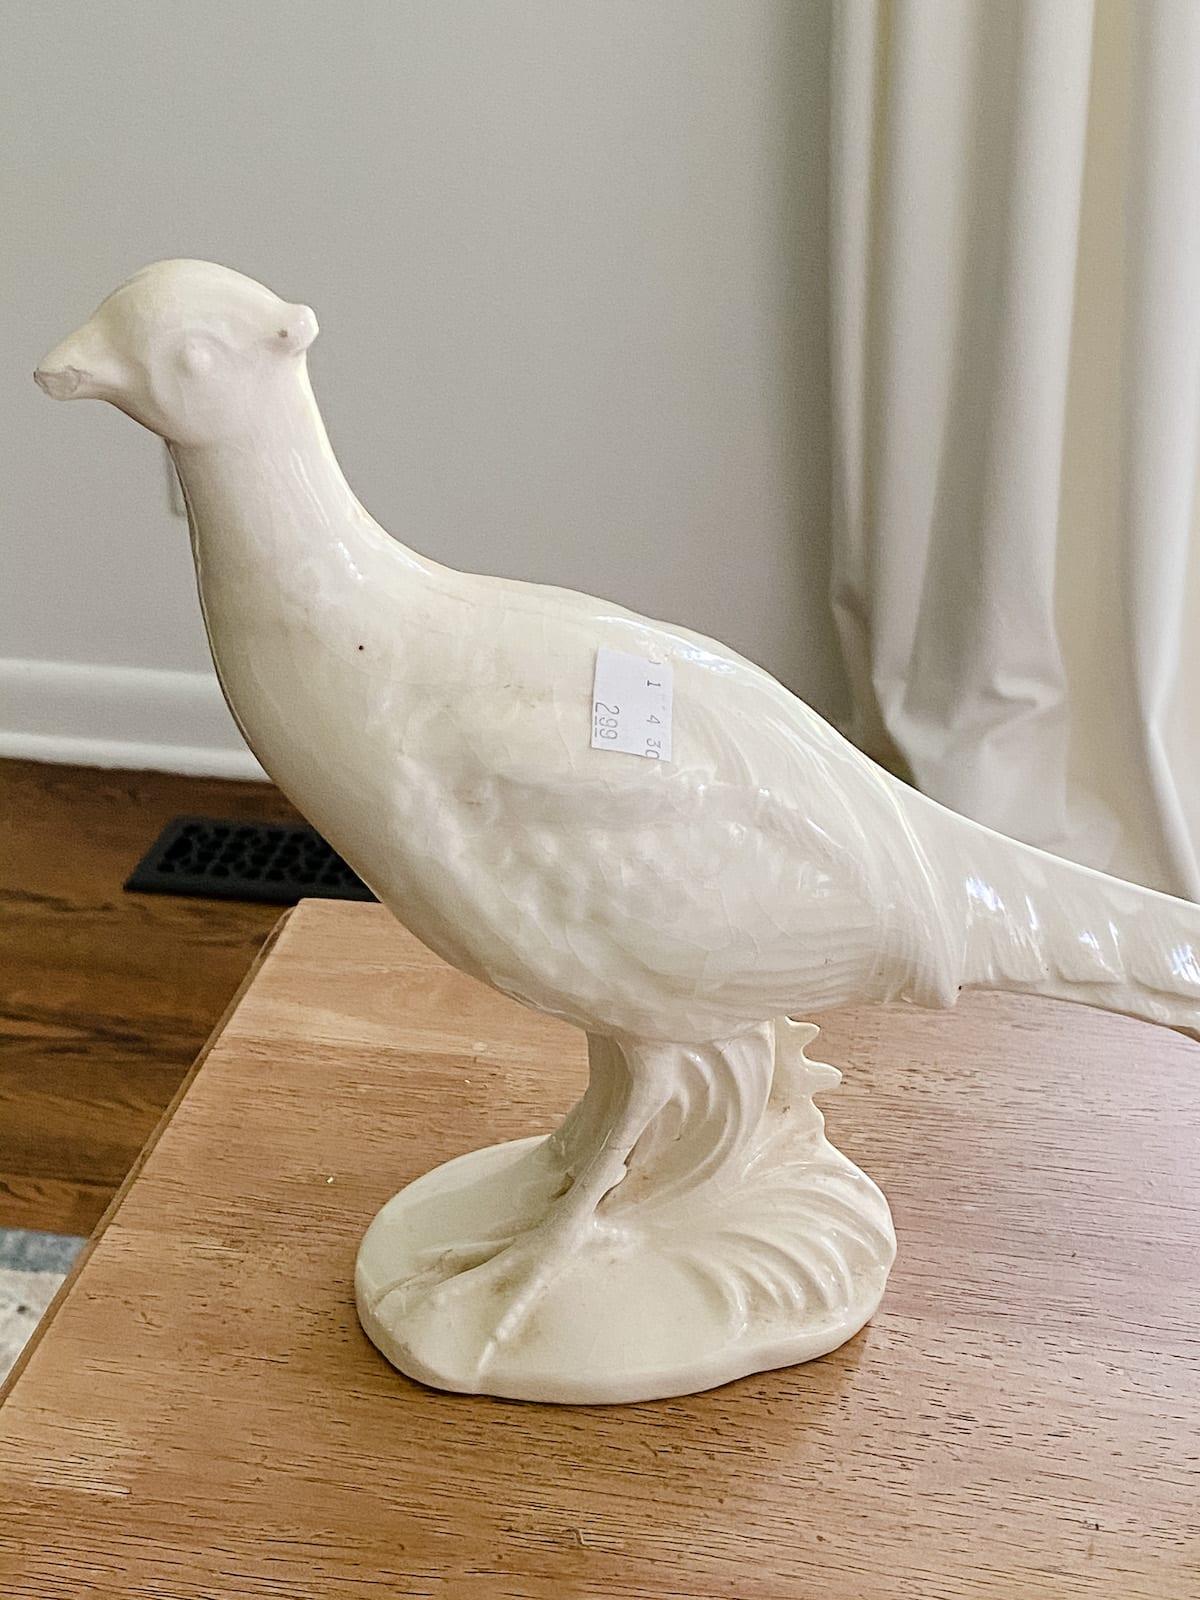 thrifted pheasant figurine